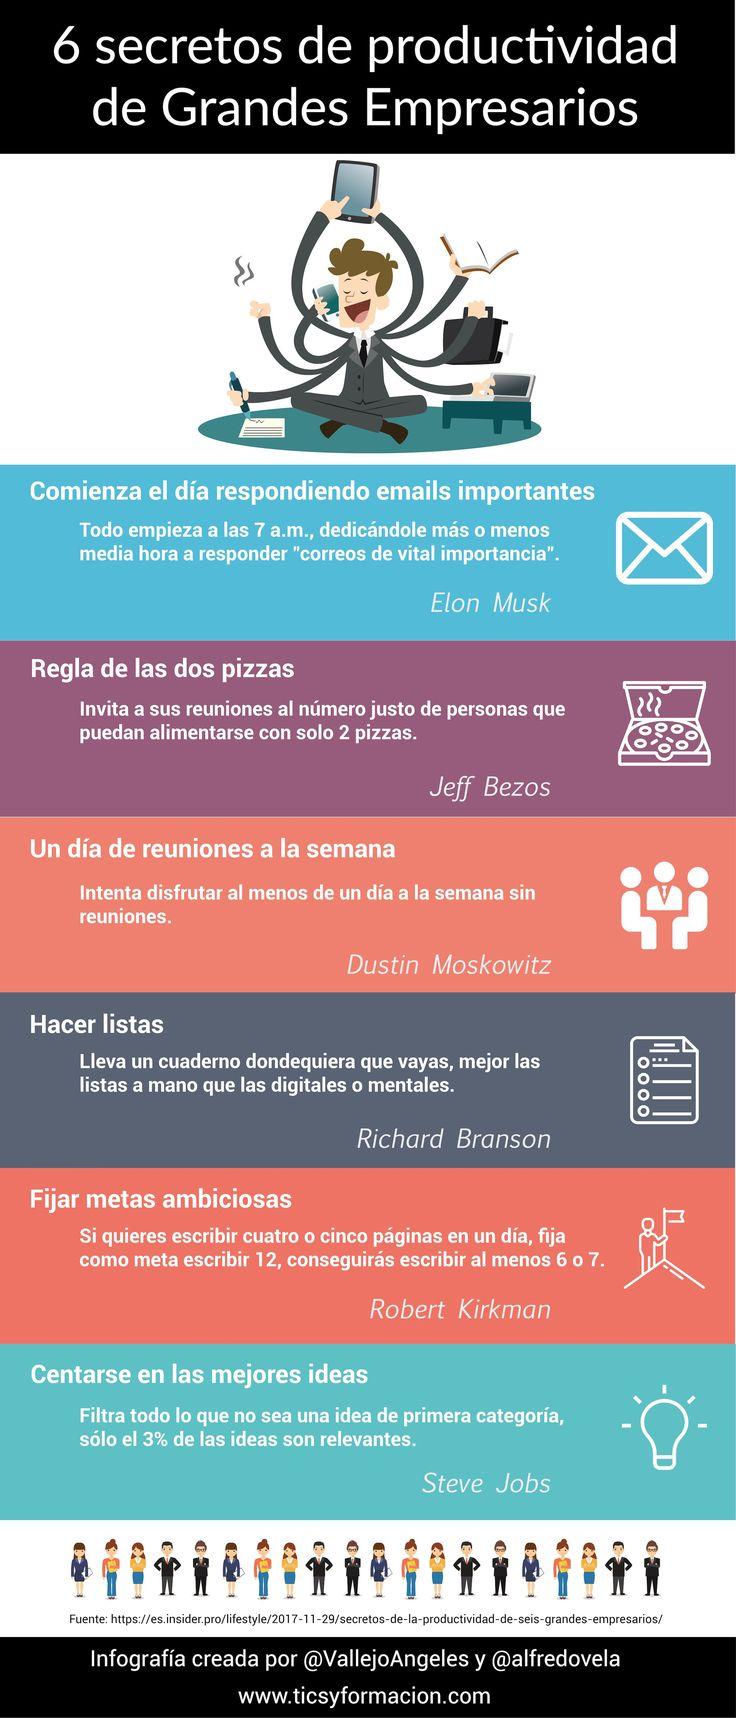 6 secretos de productividad de grandes empresarios #infografia